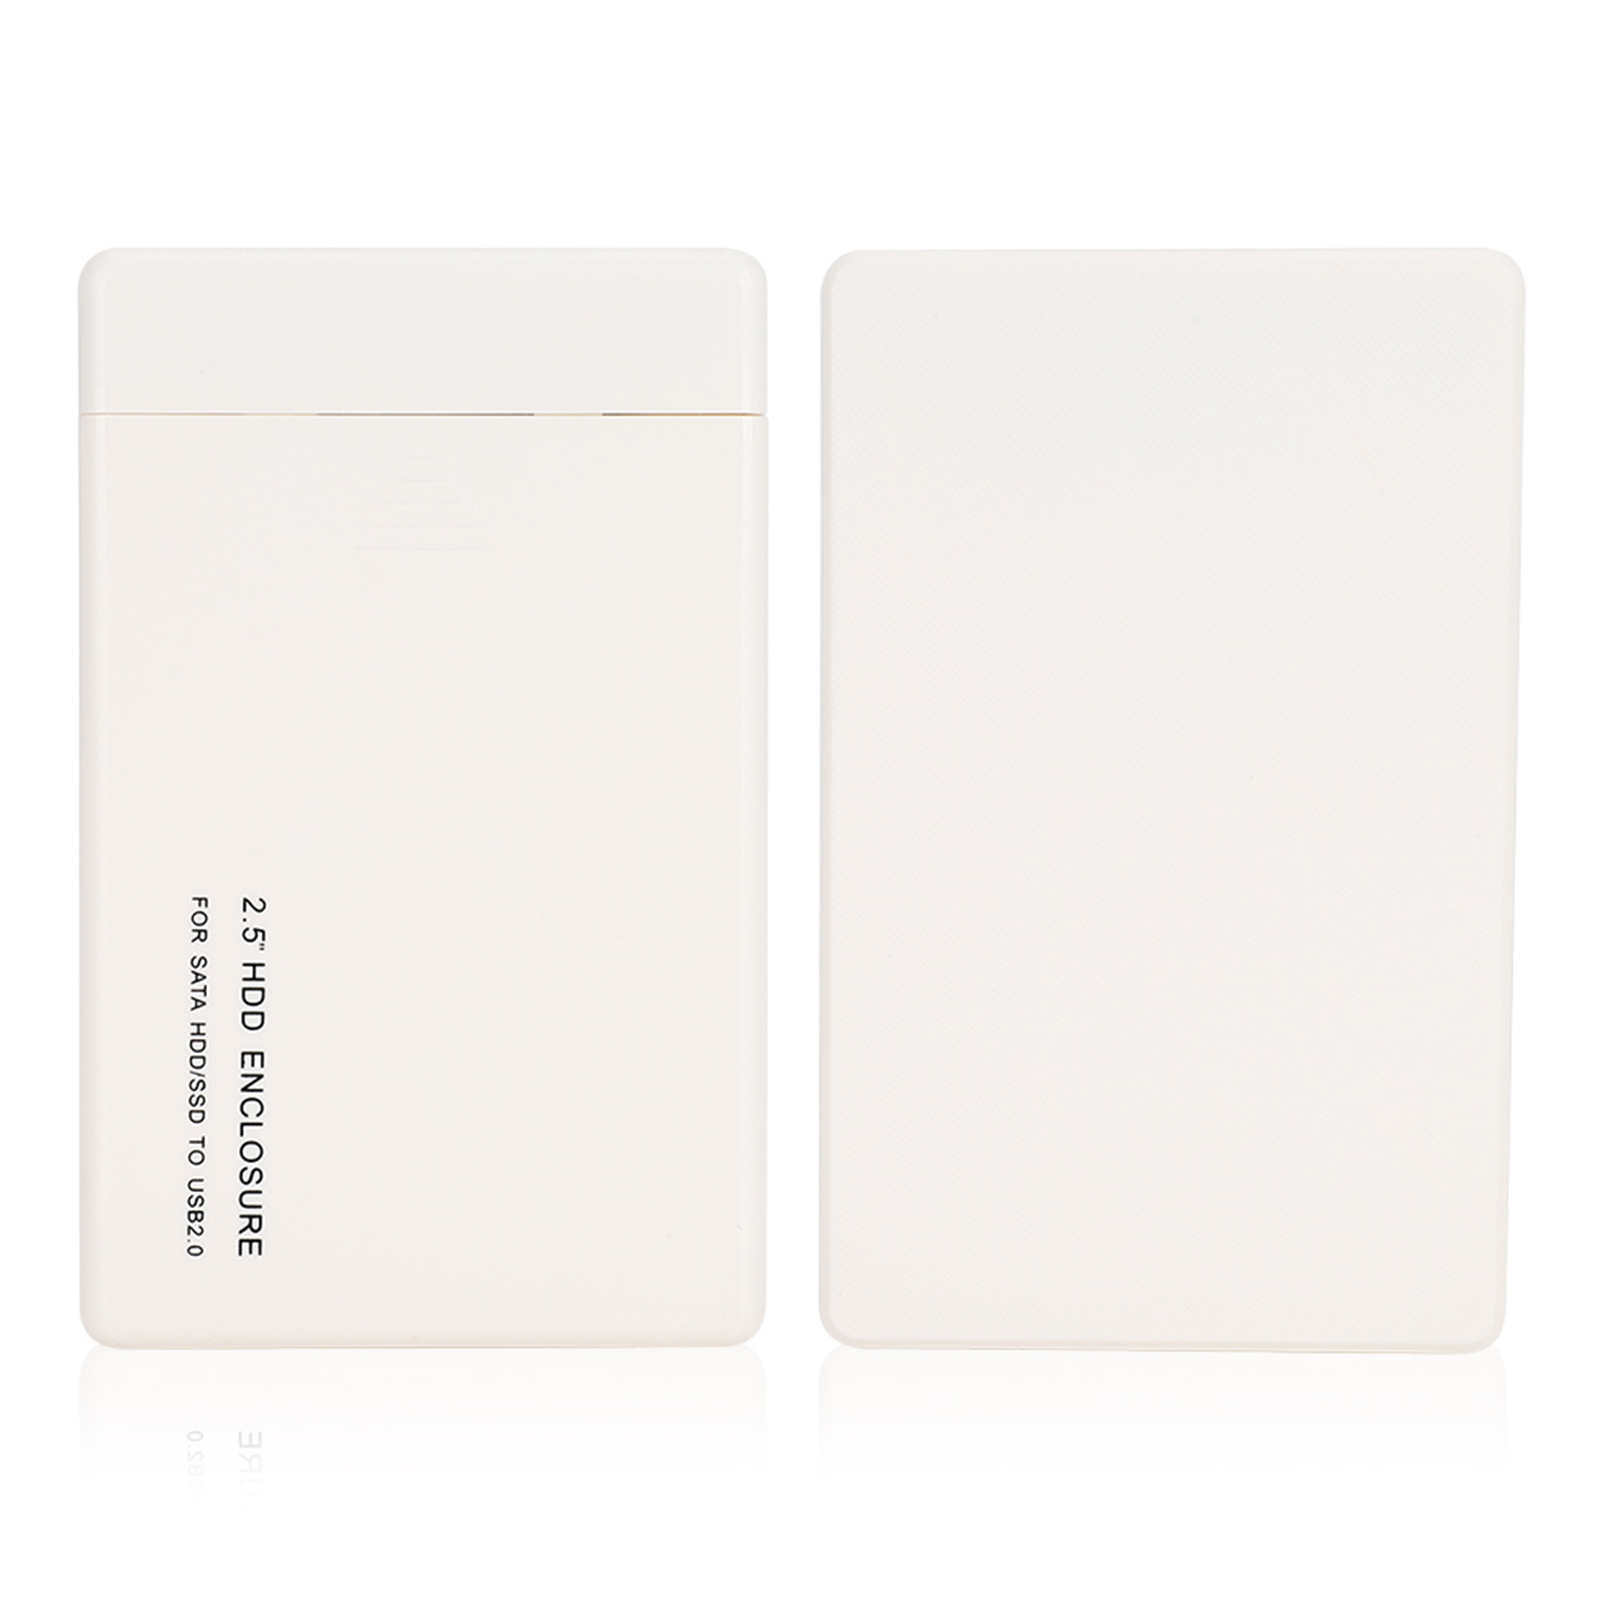 2-5-034-USB-2-0-SATA-External-SSD-HDD-Mobile-Solid-State-Hard-Disk-Box-Enclosure-LJ thumbnail 18